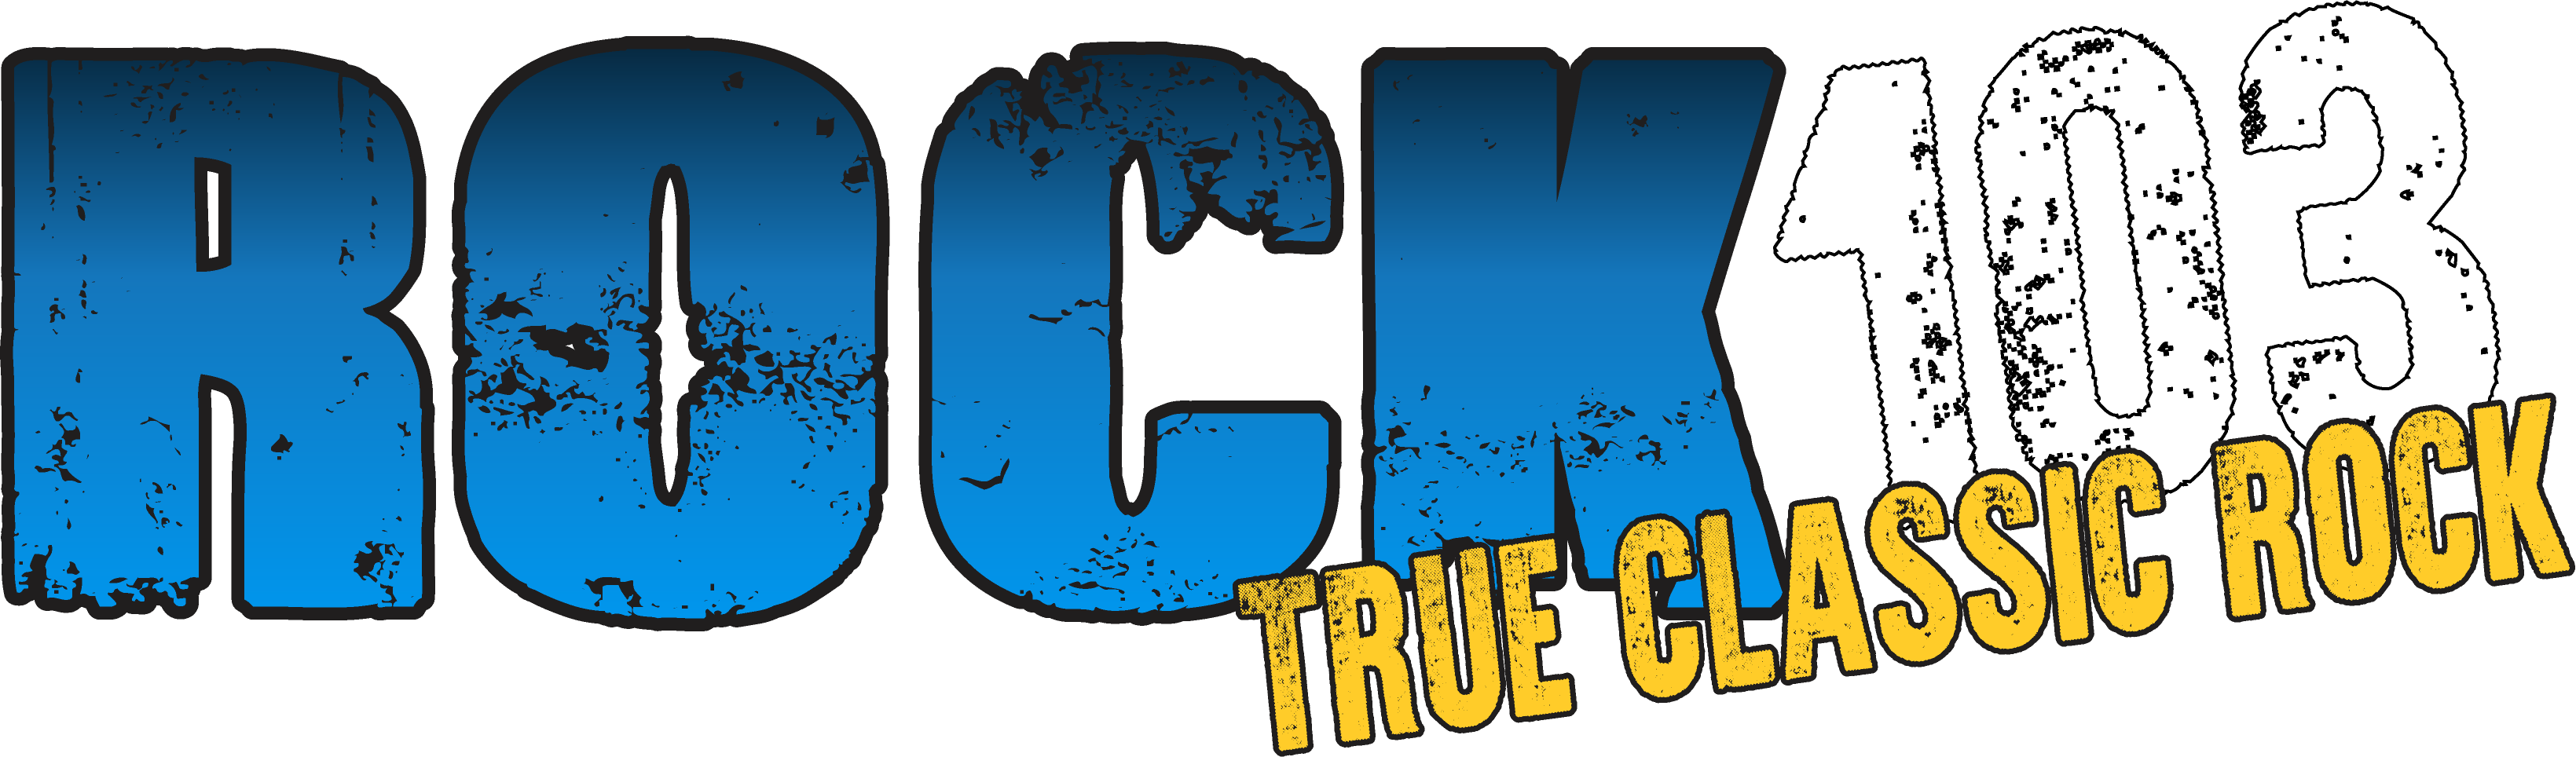 Rock 103   True Classic Rock   Pikeville, KY   WPKE-FM